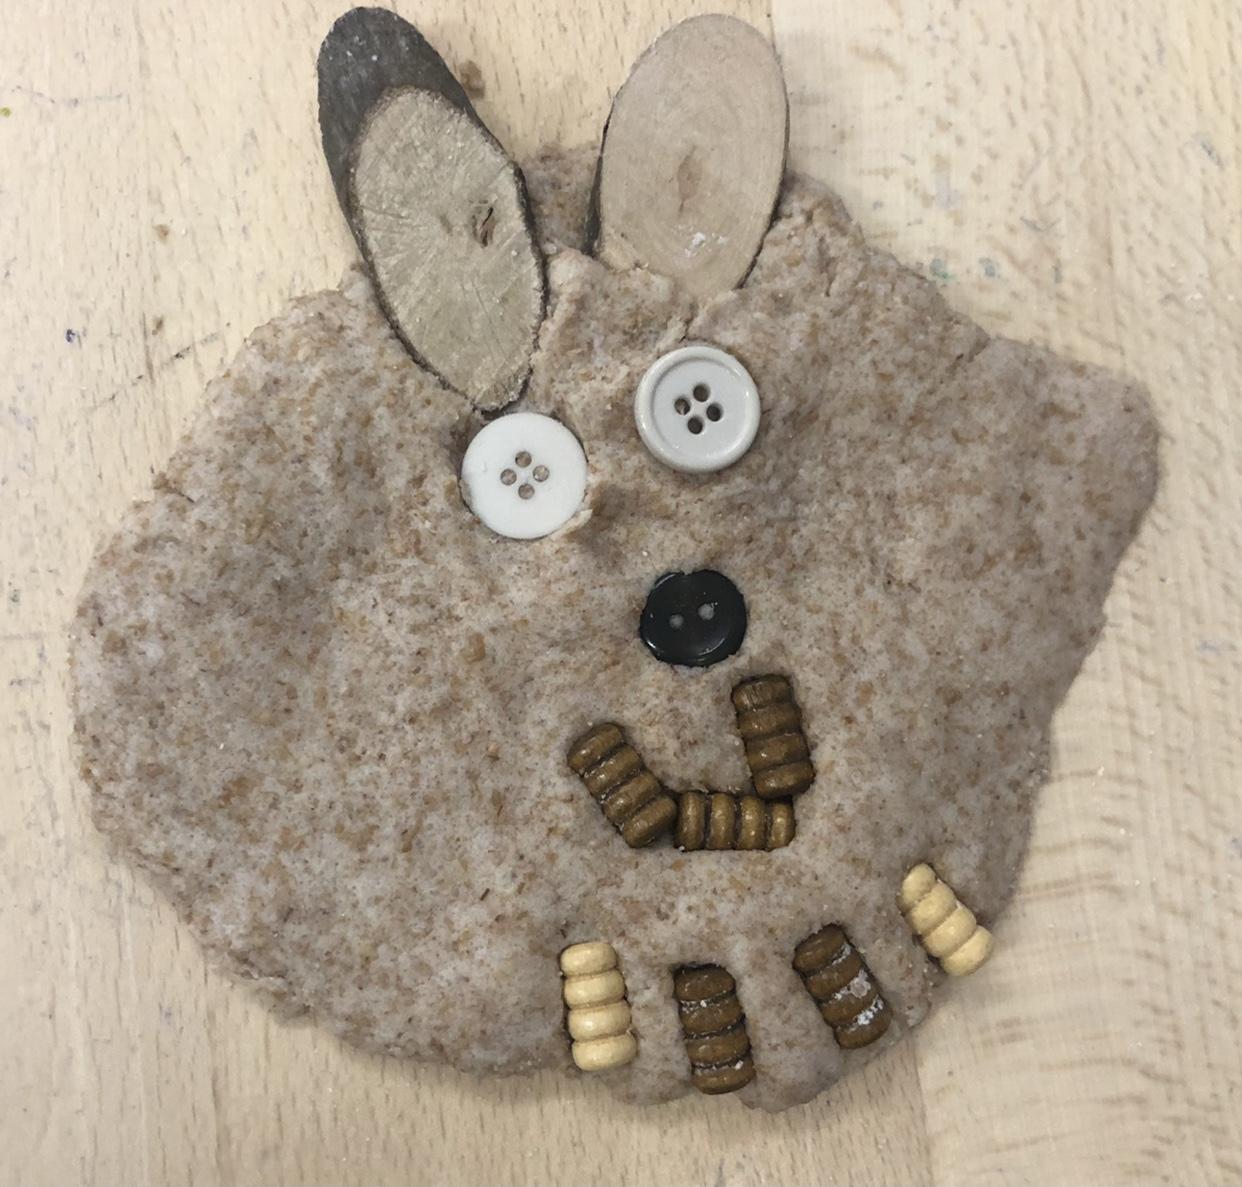 Making play-dough bears